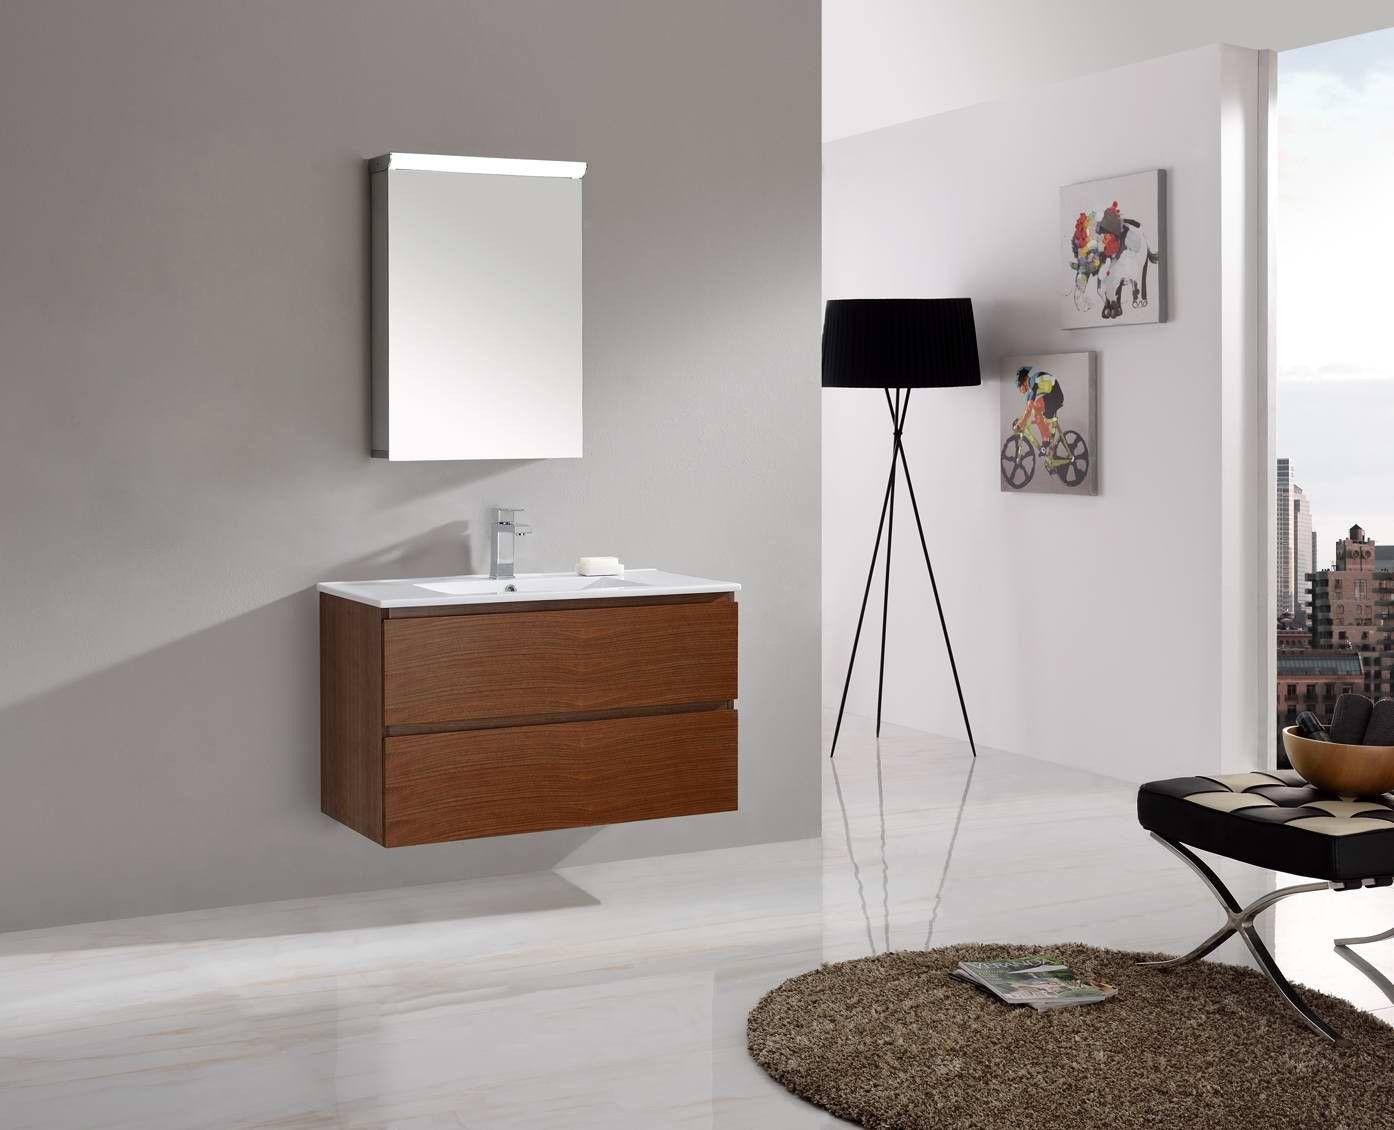 Madero 900 Timber Walnut Veneer Bathroom Modern Contemporary Wall ...